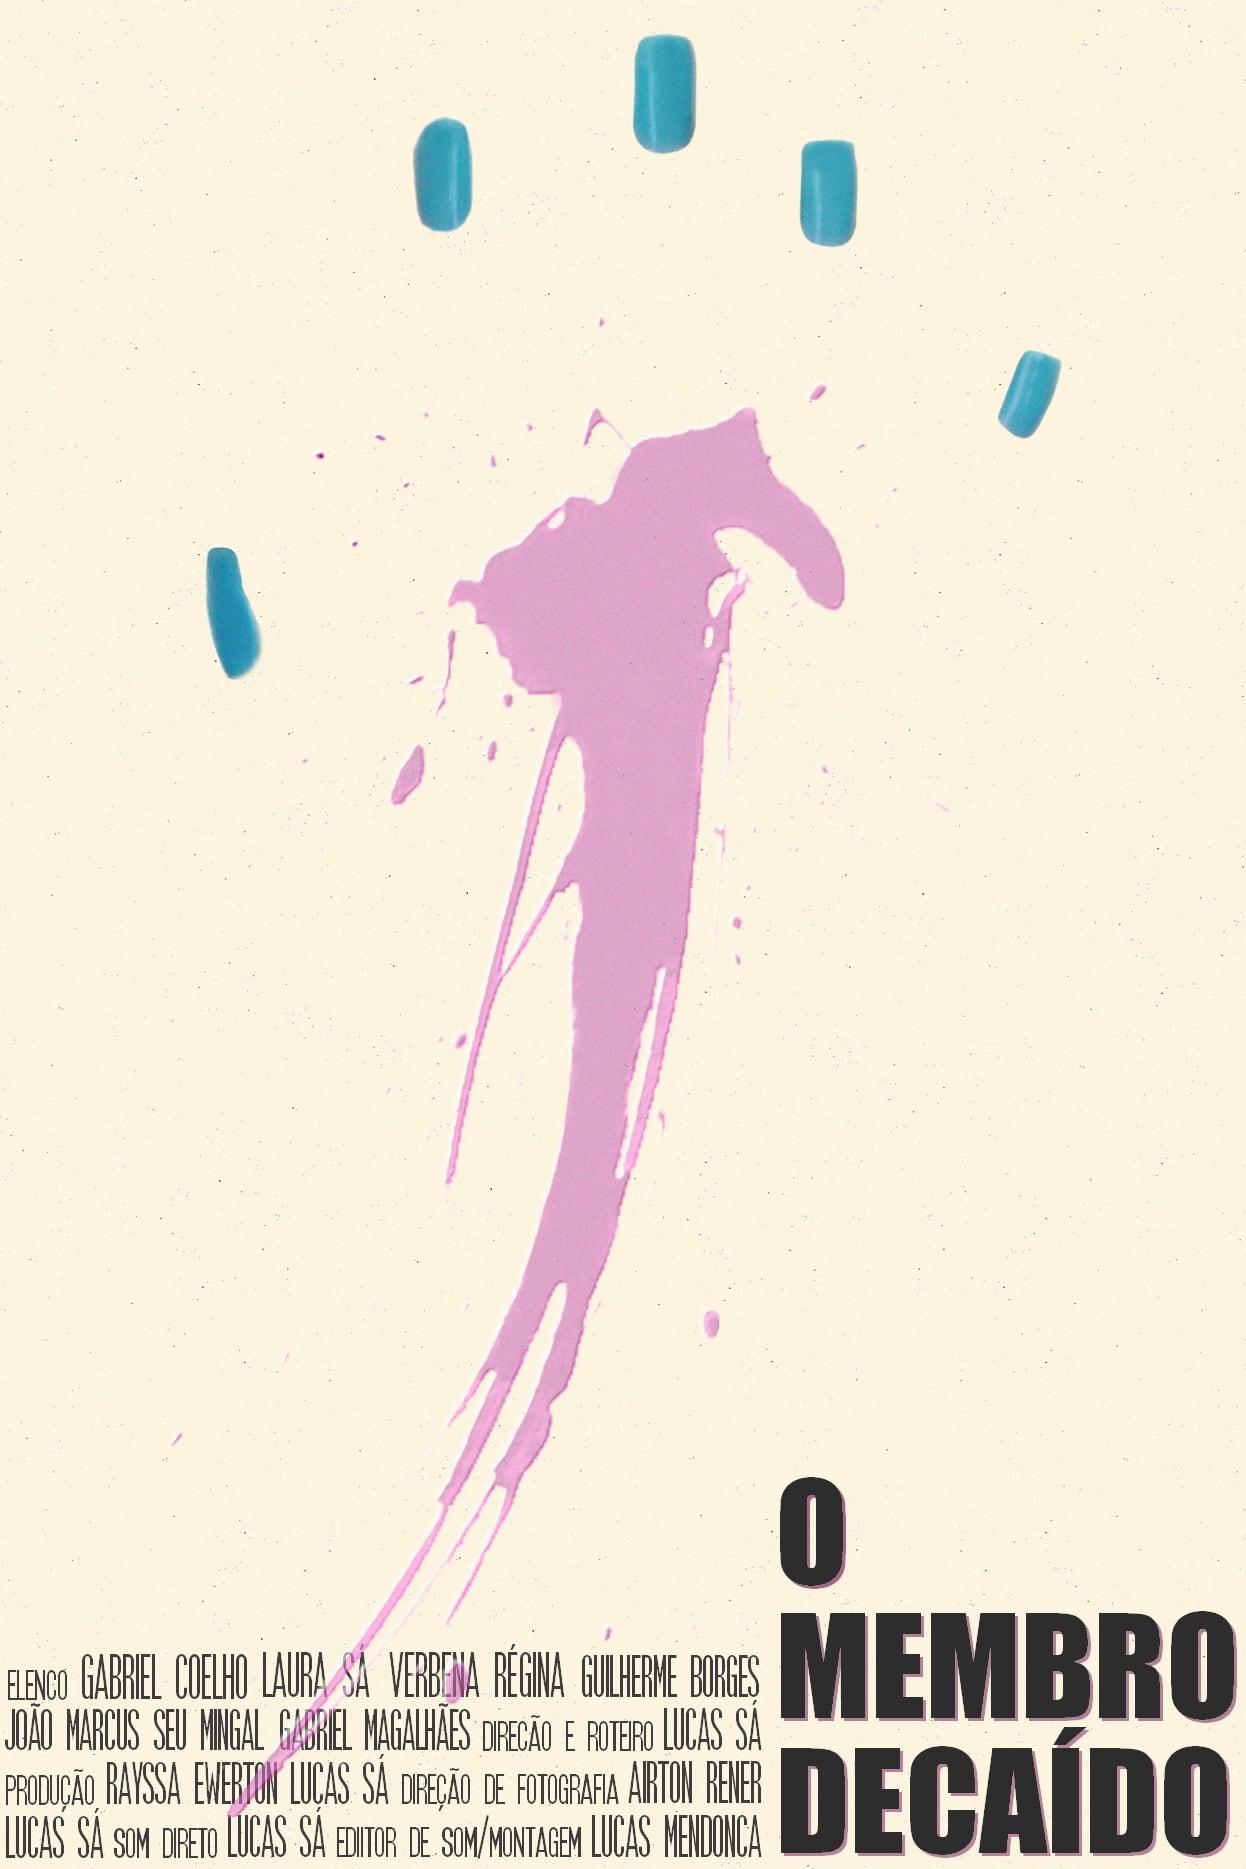 The Fallen Member (2012)